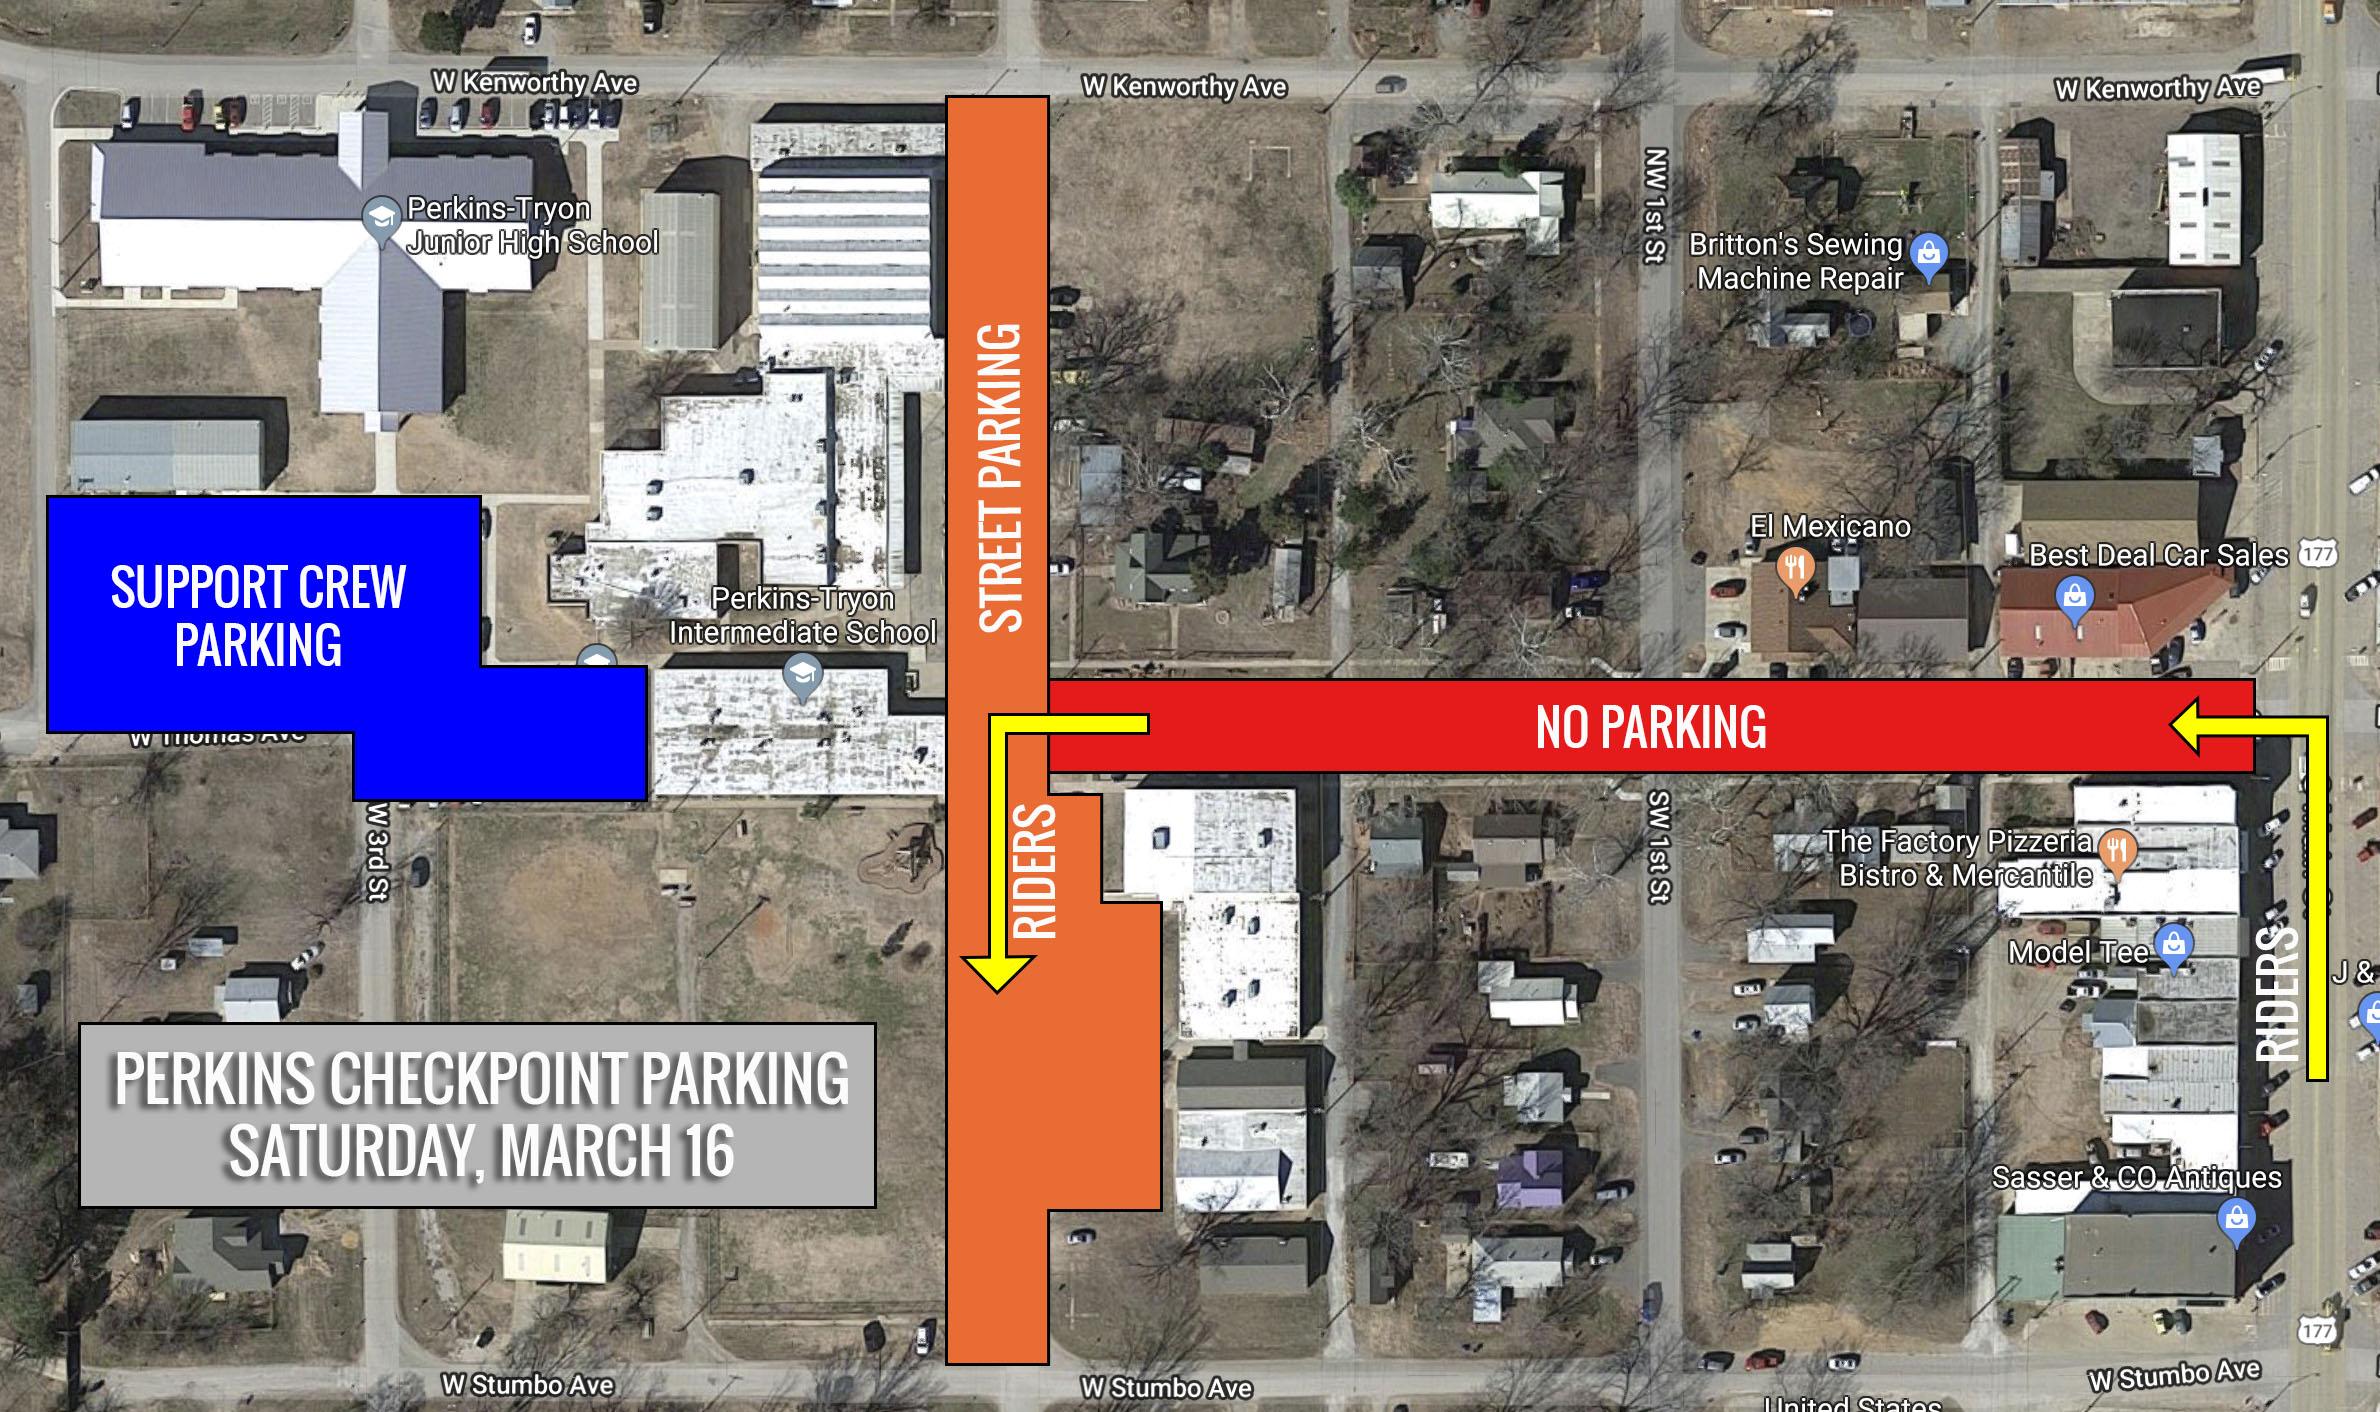 Perkins Checkpoint Parking.jpg